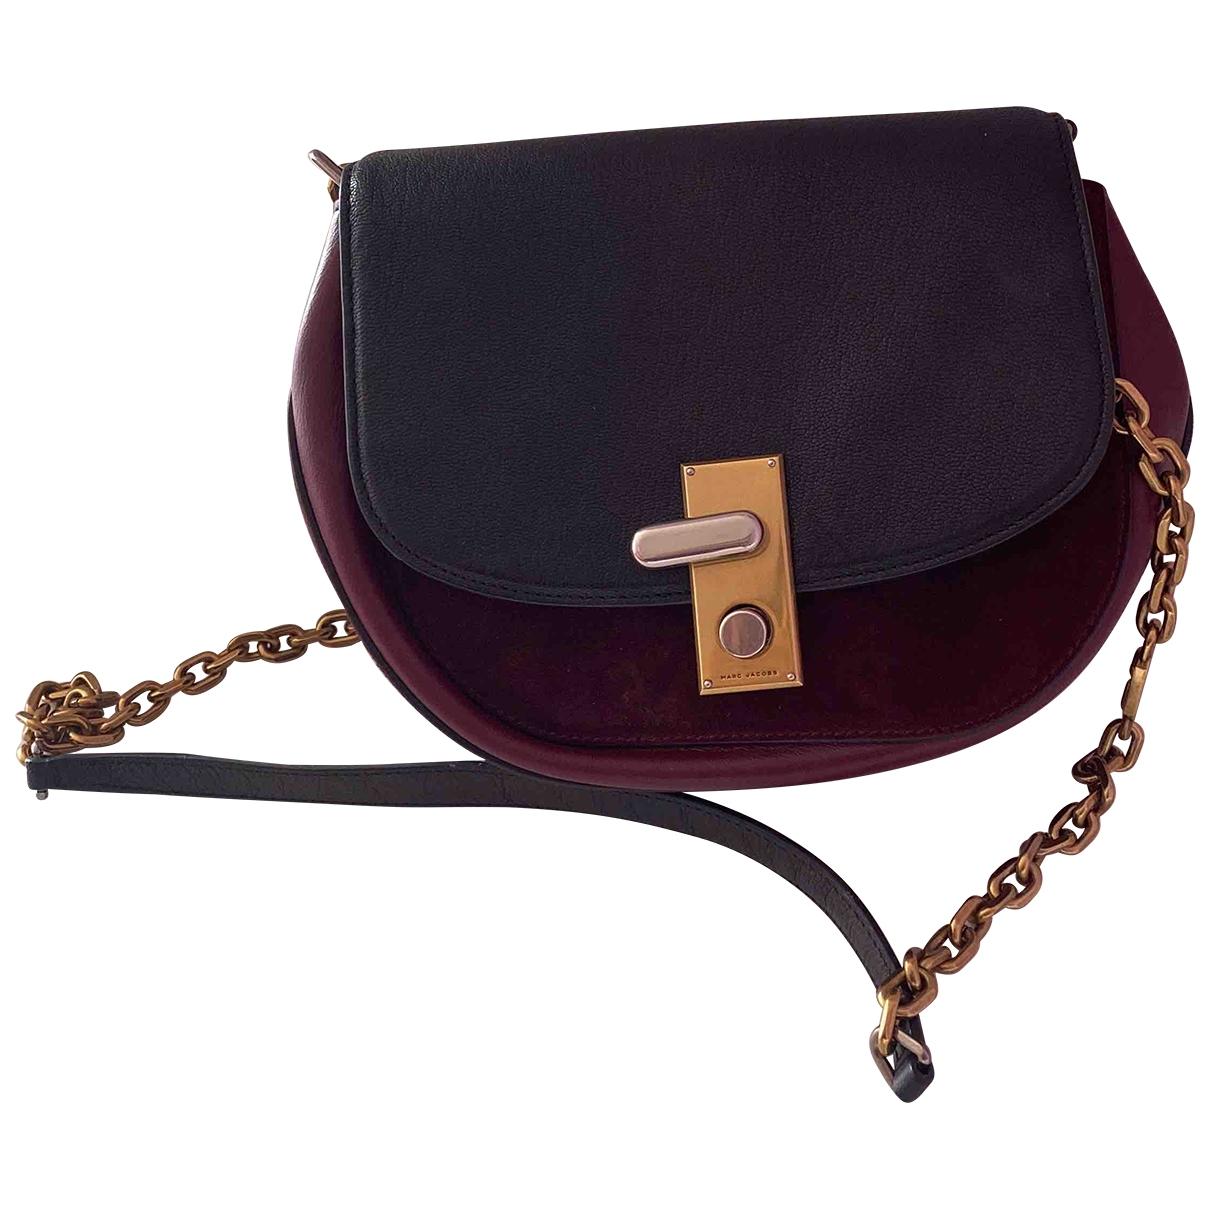 Marc Jacobs \N Red Leather handbag for Women \N